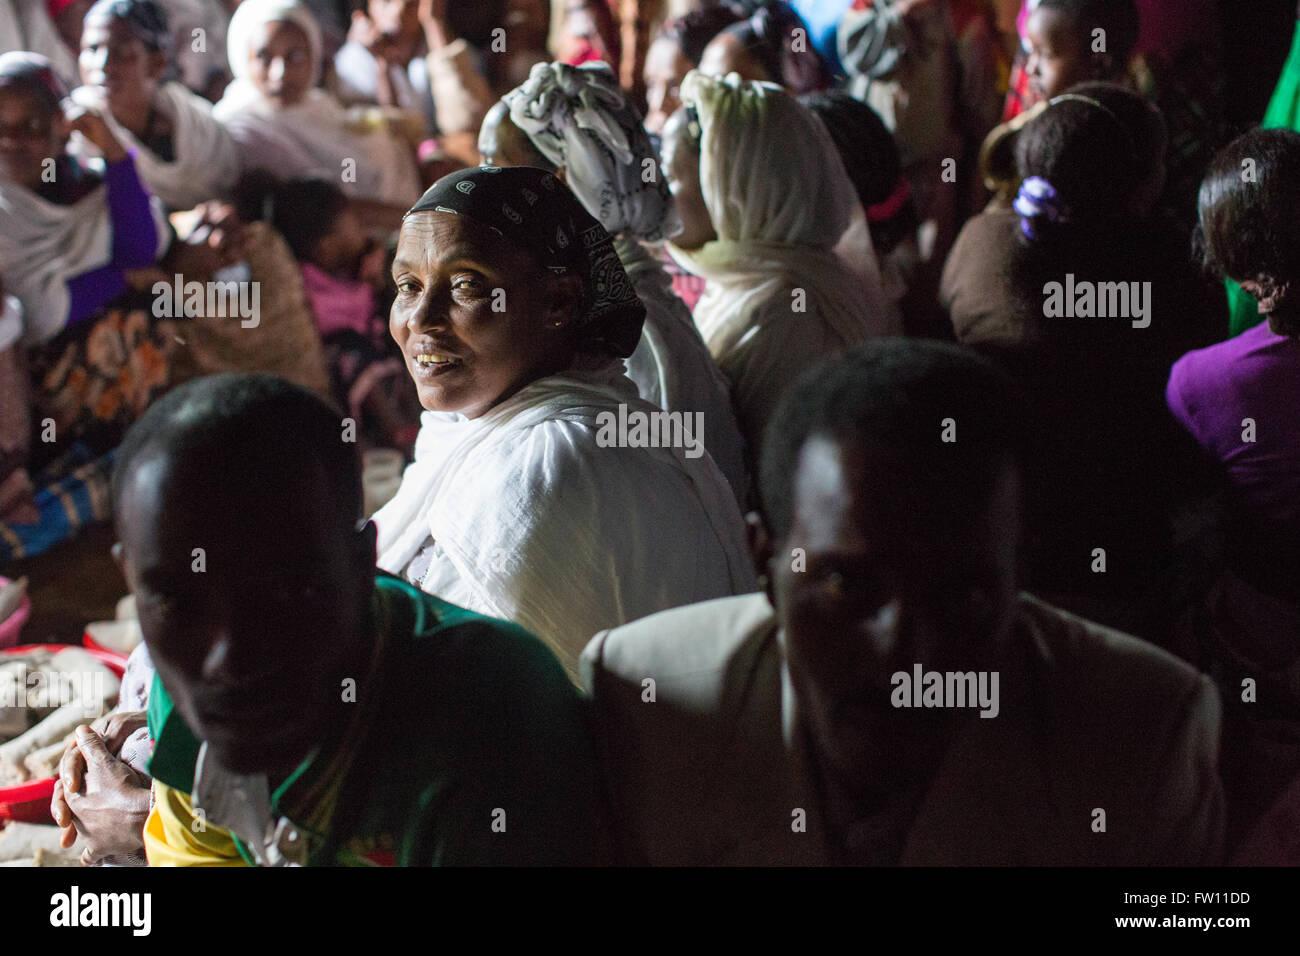 Gibi village, Gurage, Ethiopia, 6th October 2013 People gather for a wedding celebration as today is auspicious - Stock Image